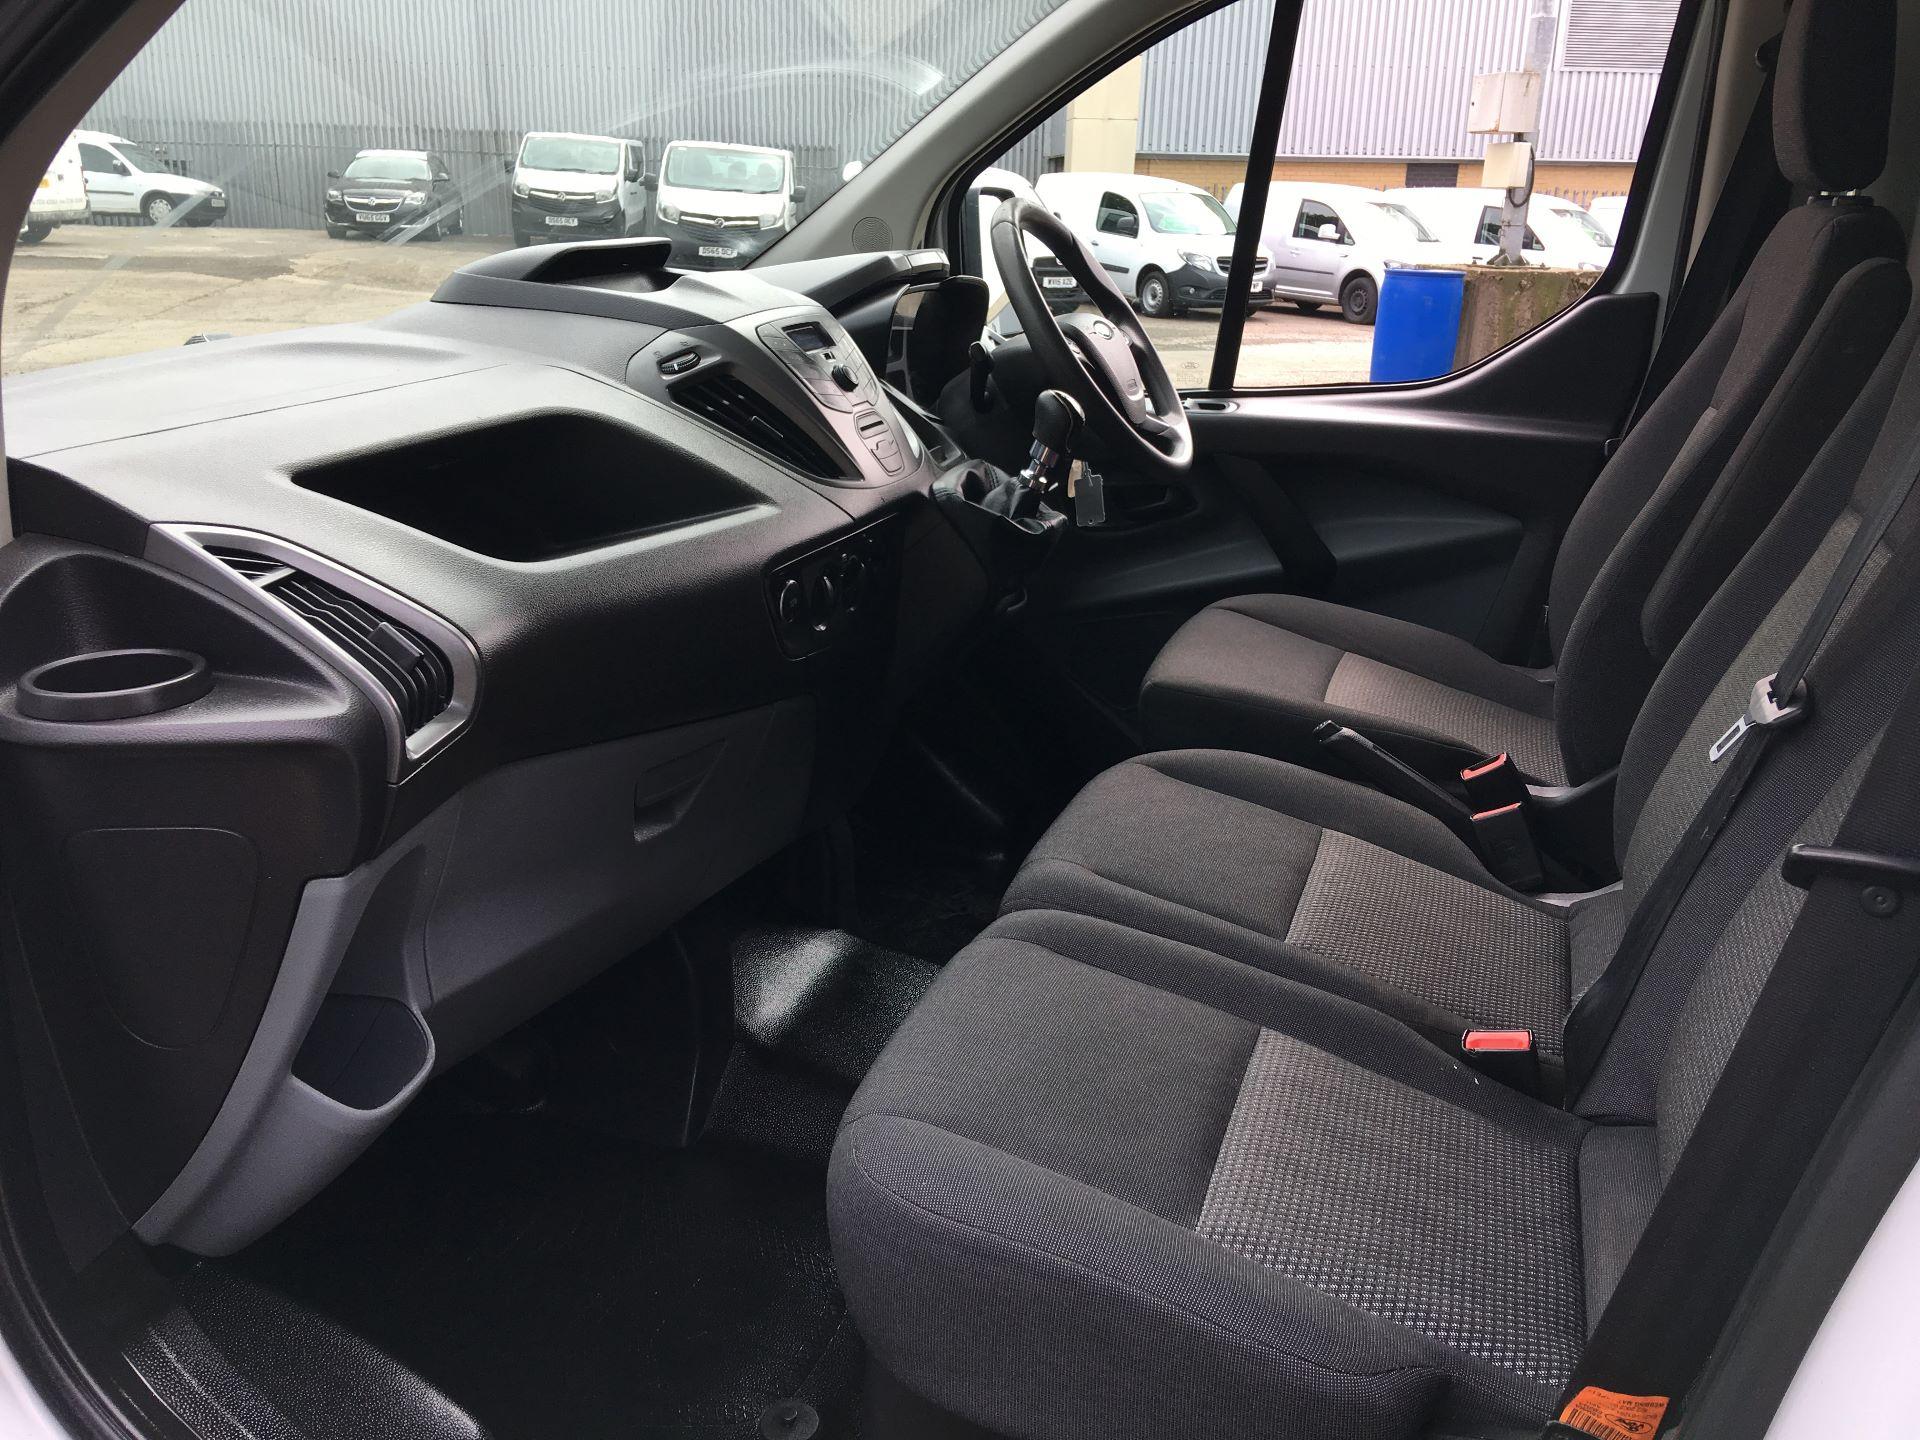 2016 Ford Transit Custom 290 L1 DIESEL FWD 2.0 TDCI 105PS HIGH ROOF VAN EURO 6 (SK66VKG) Image 13